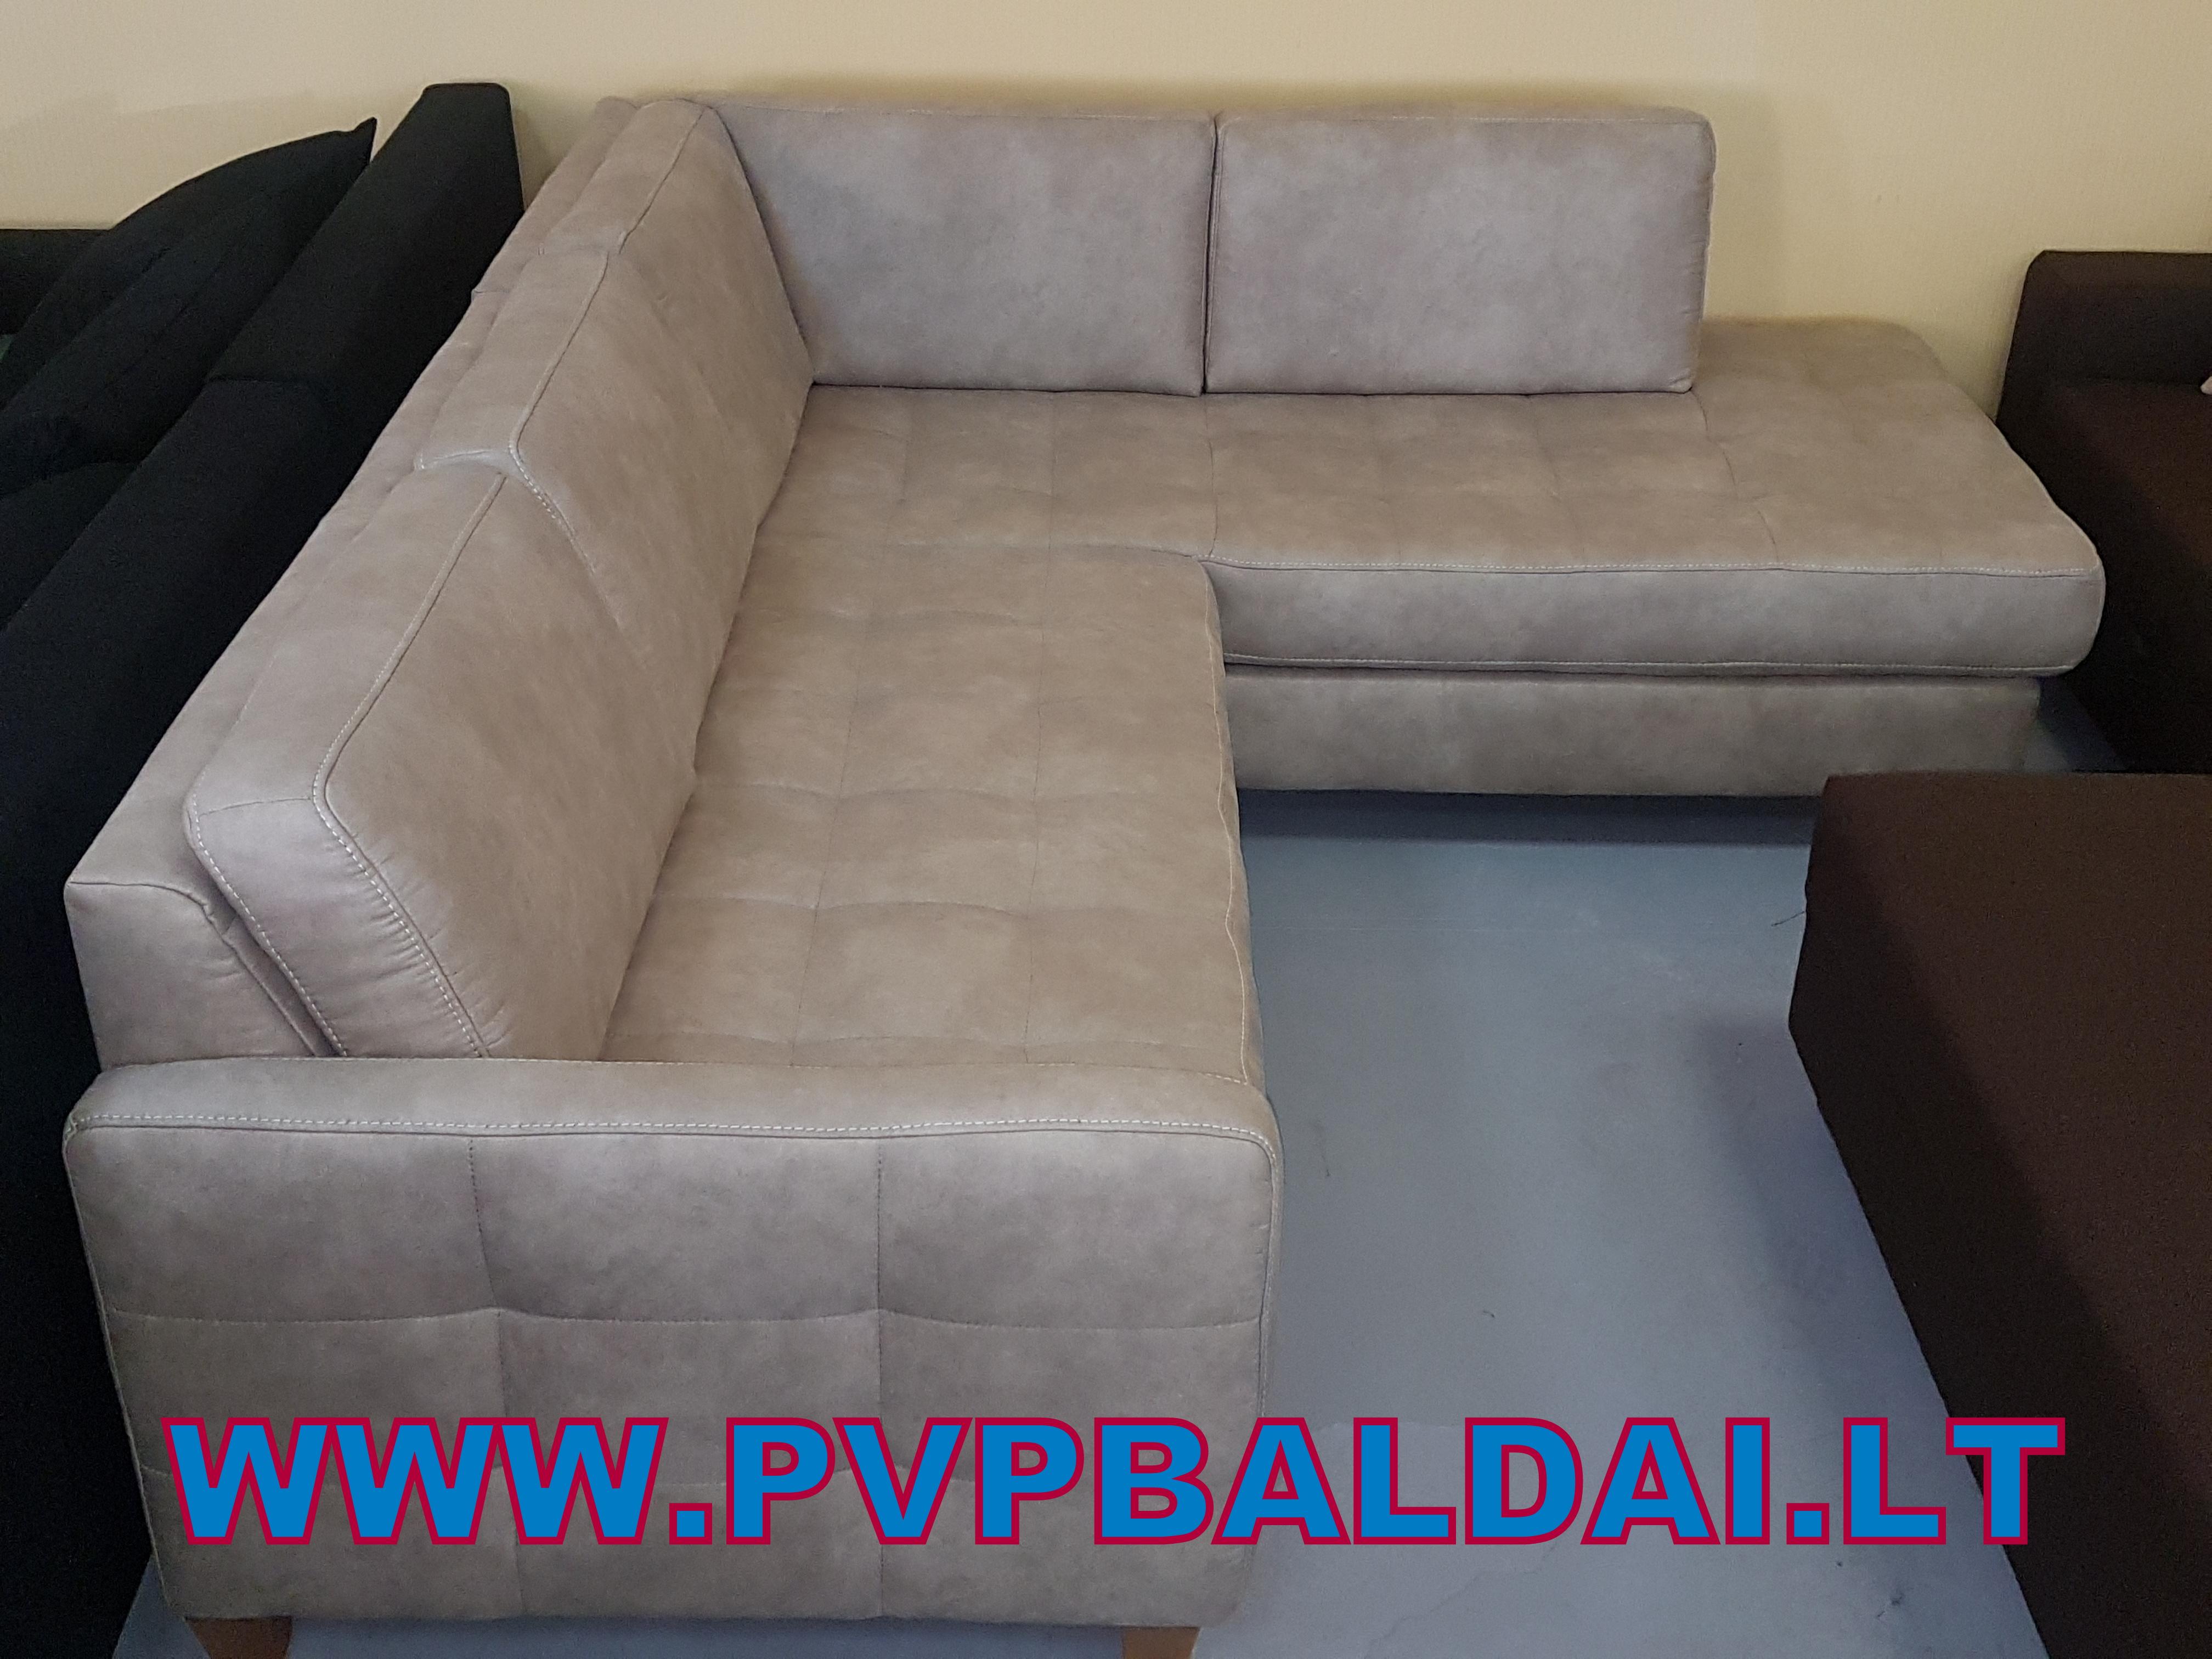 pvp baldai2